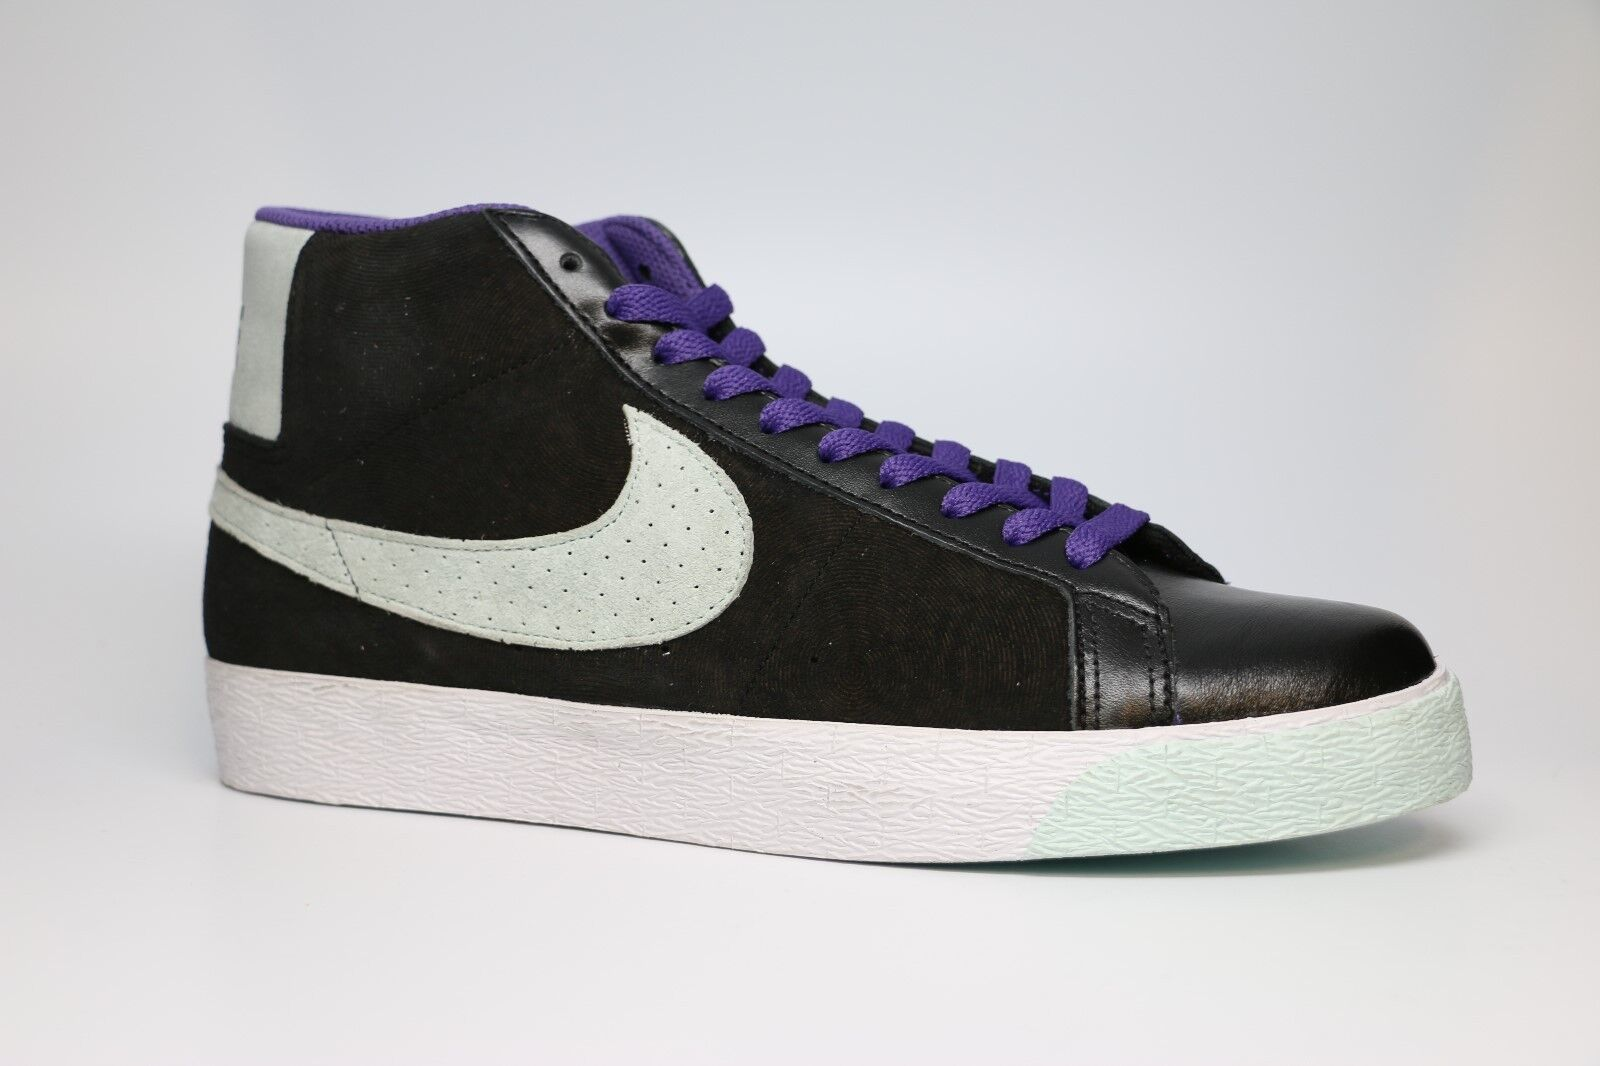 NIB Nike Blazer SB  Black Ice  Optical Illusion Pack   SZ 10   Style 314070-031